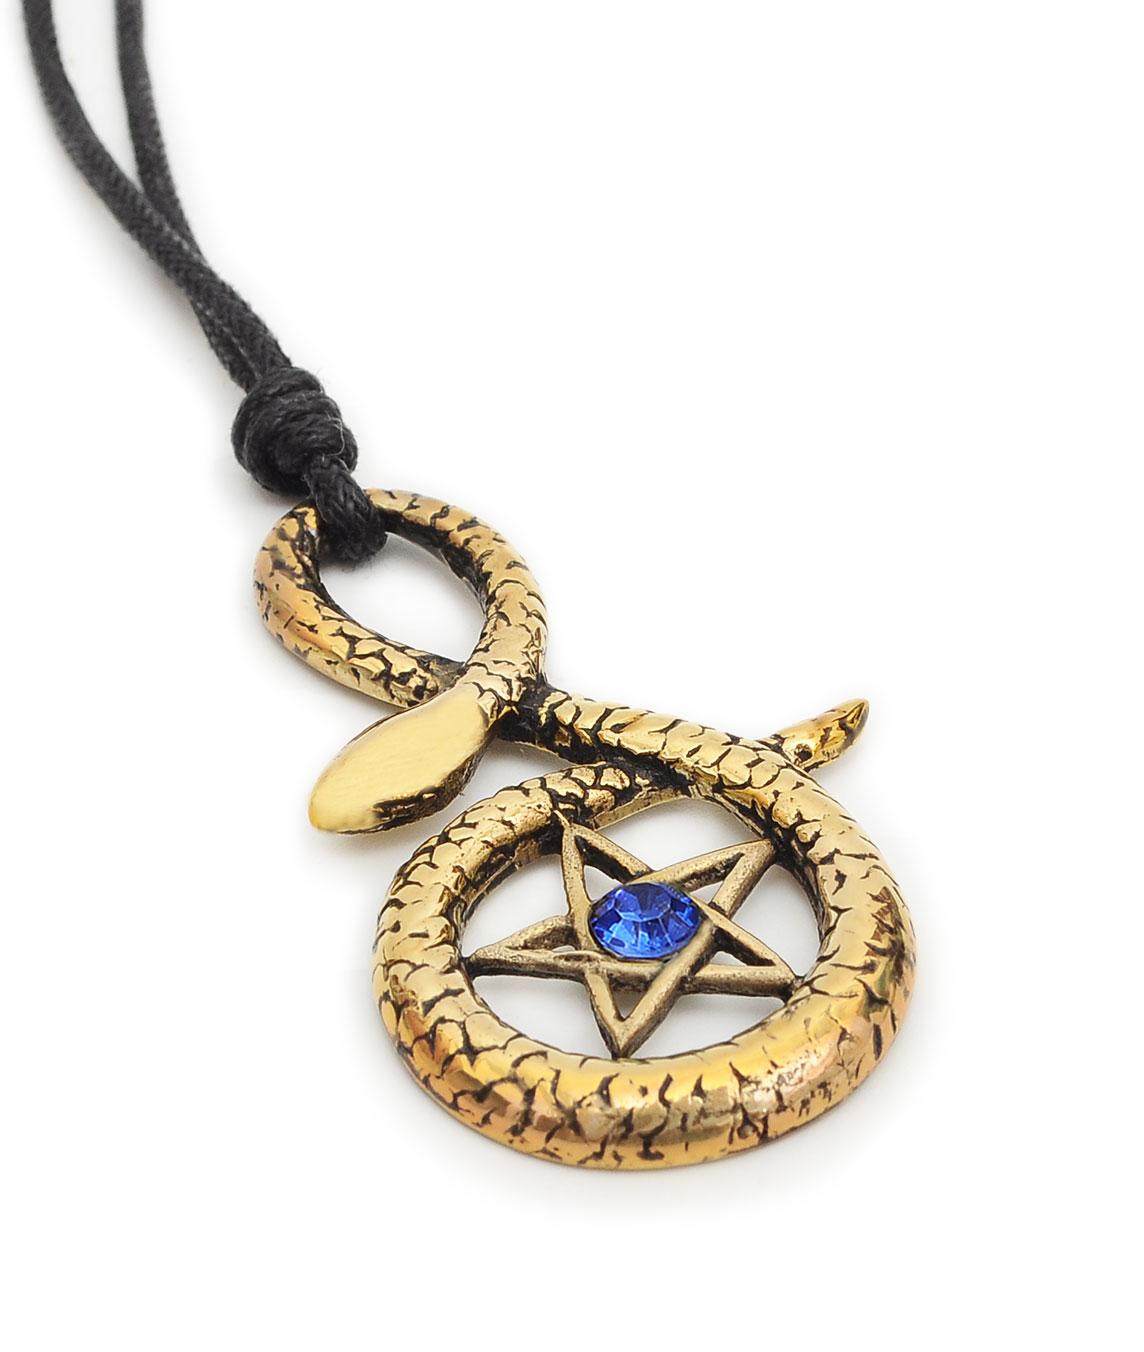 pentagram snake handmade brass necklace pendant jewelry ebay